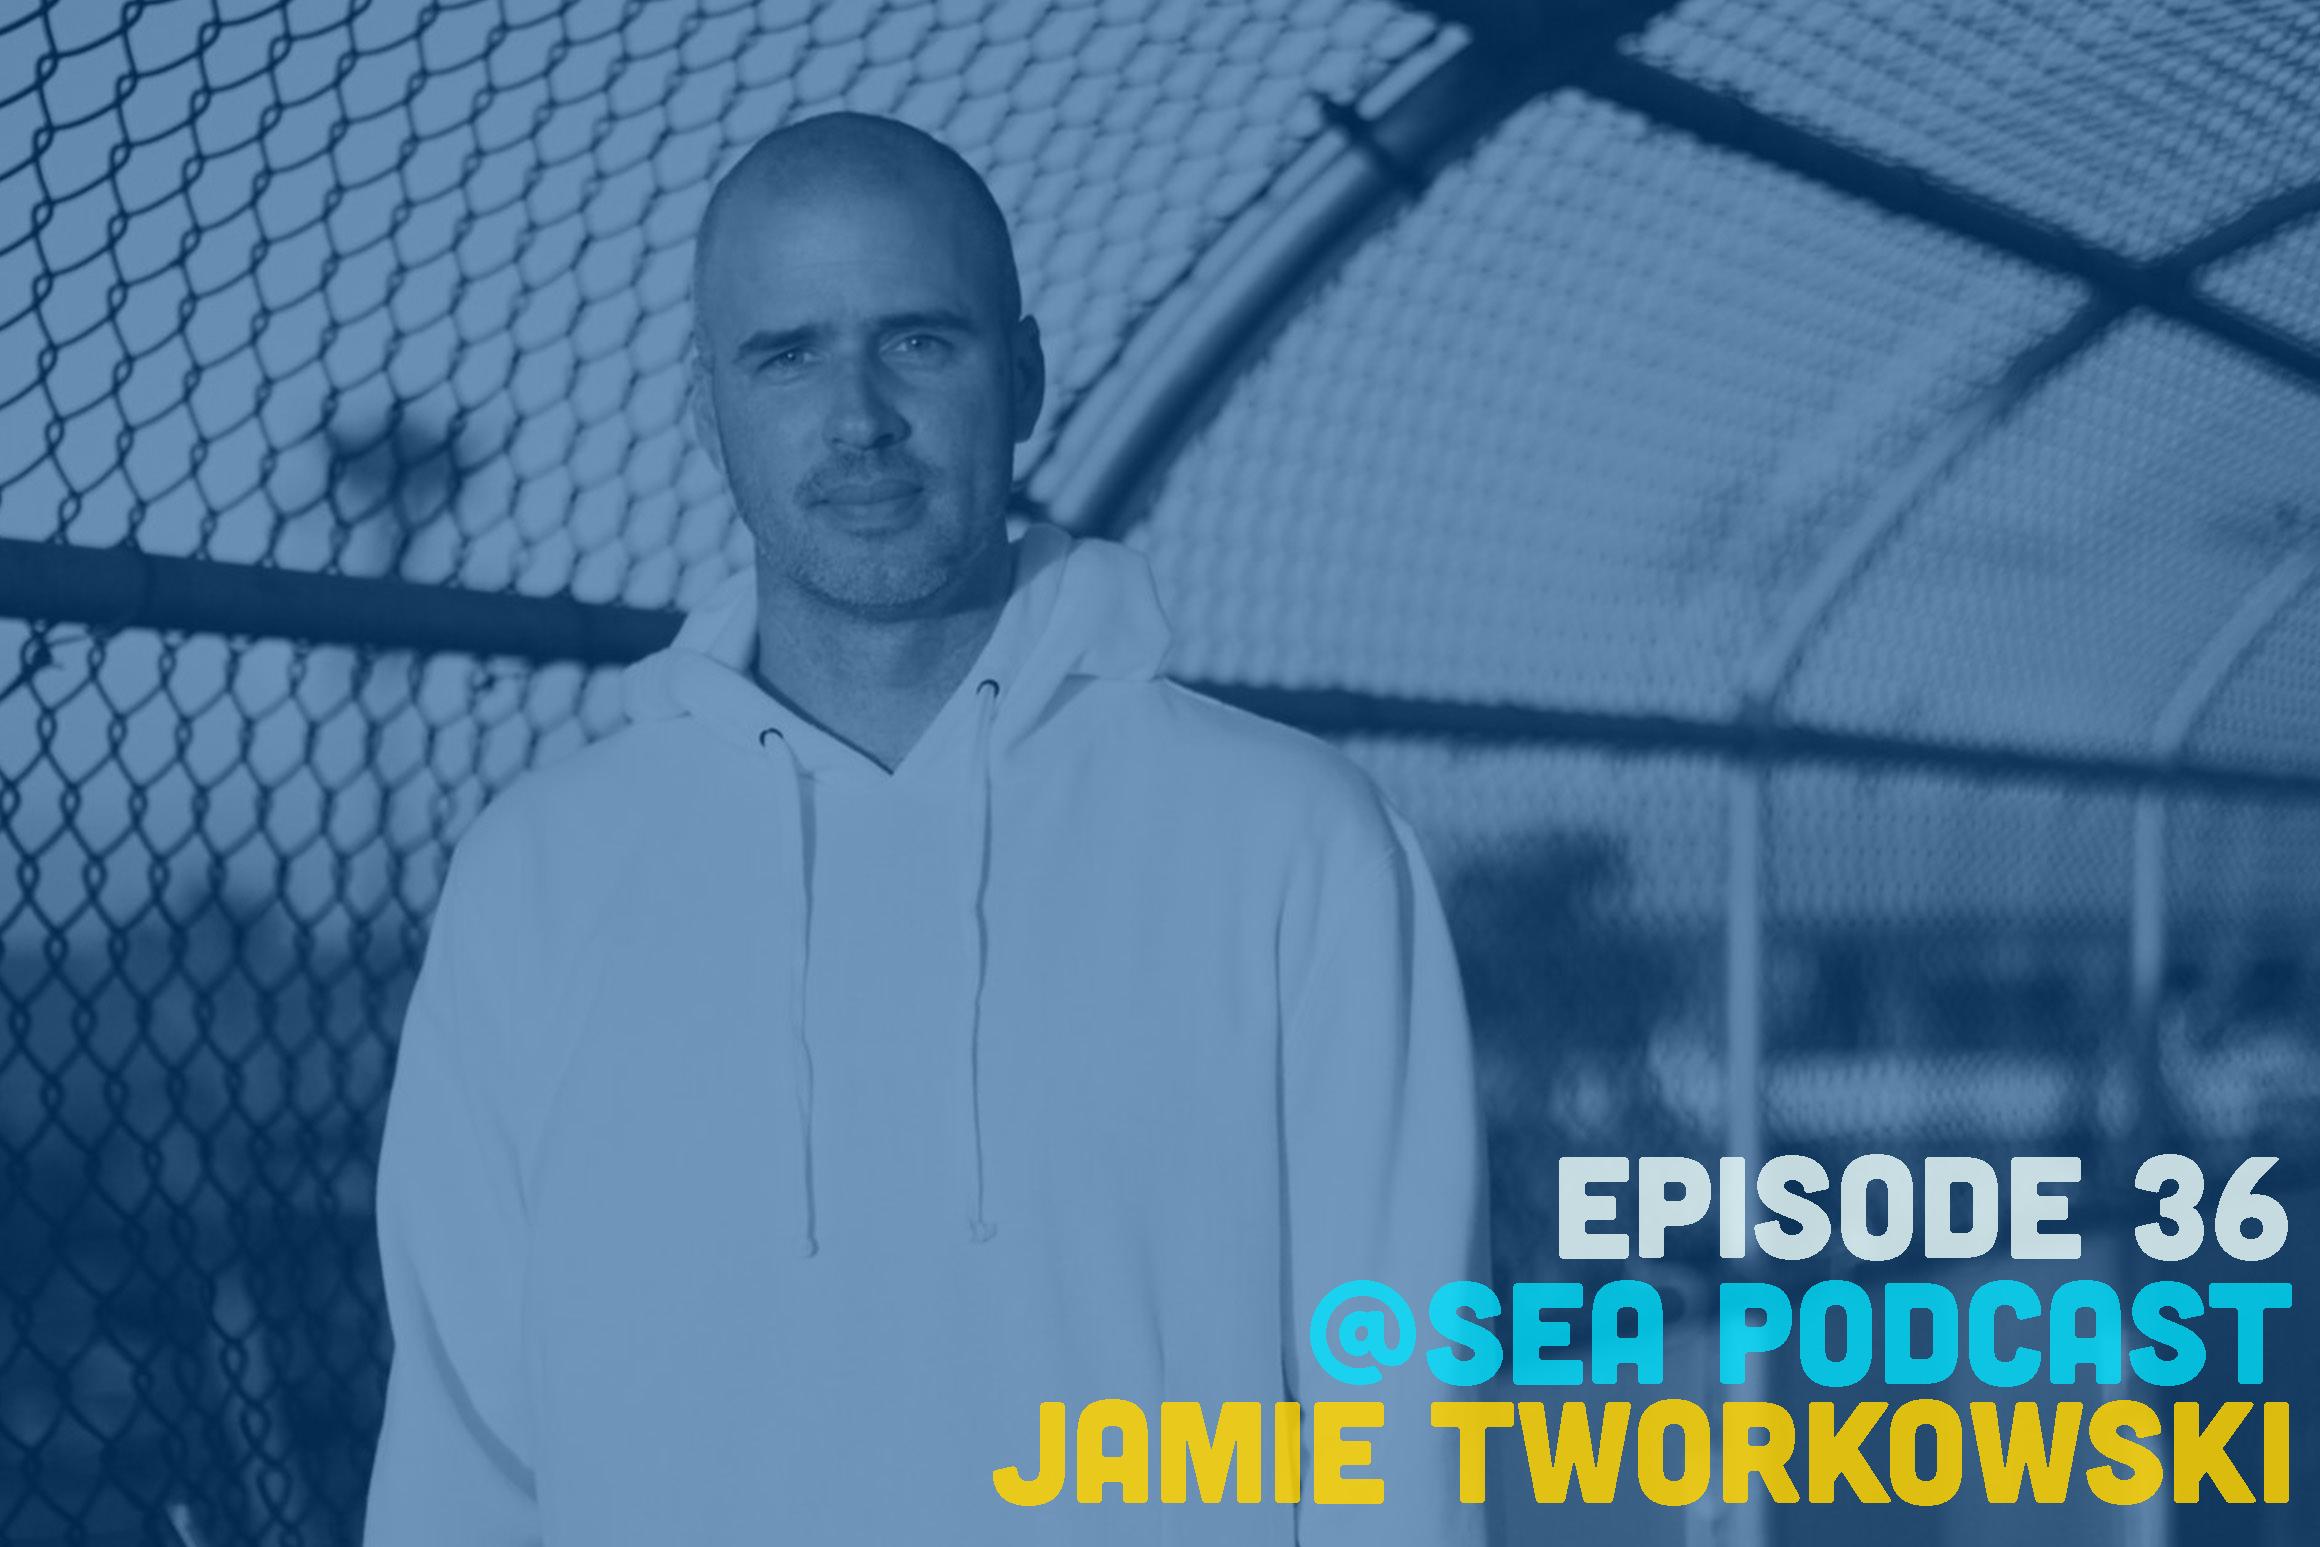 @ Sea Podcast #36: Jamie Tworkowski